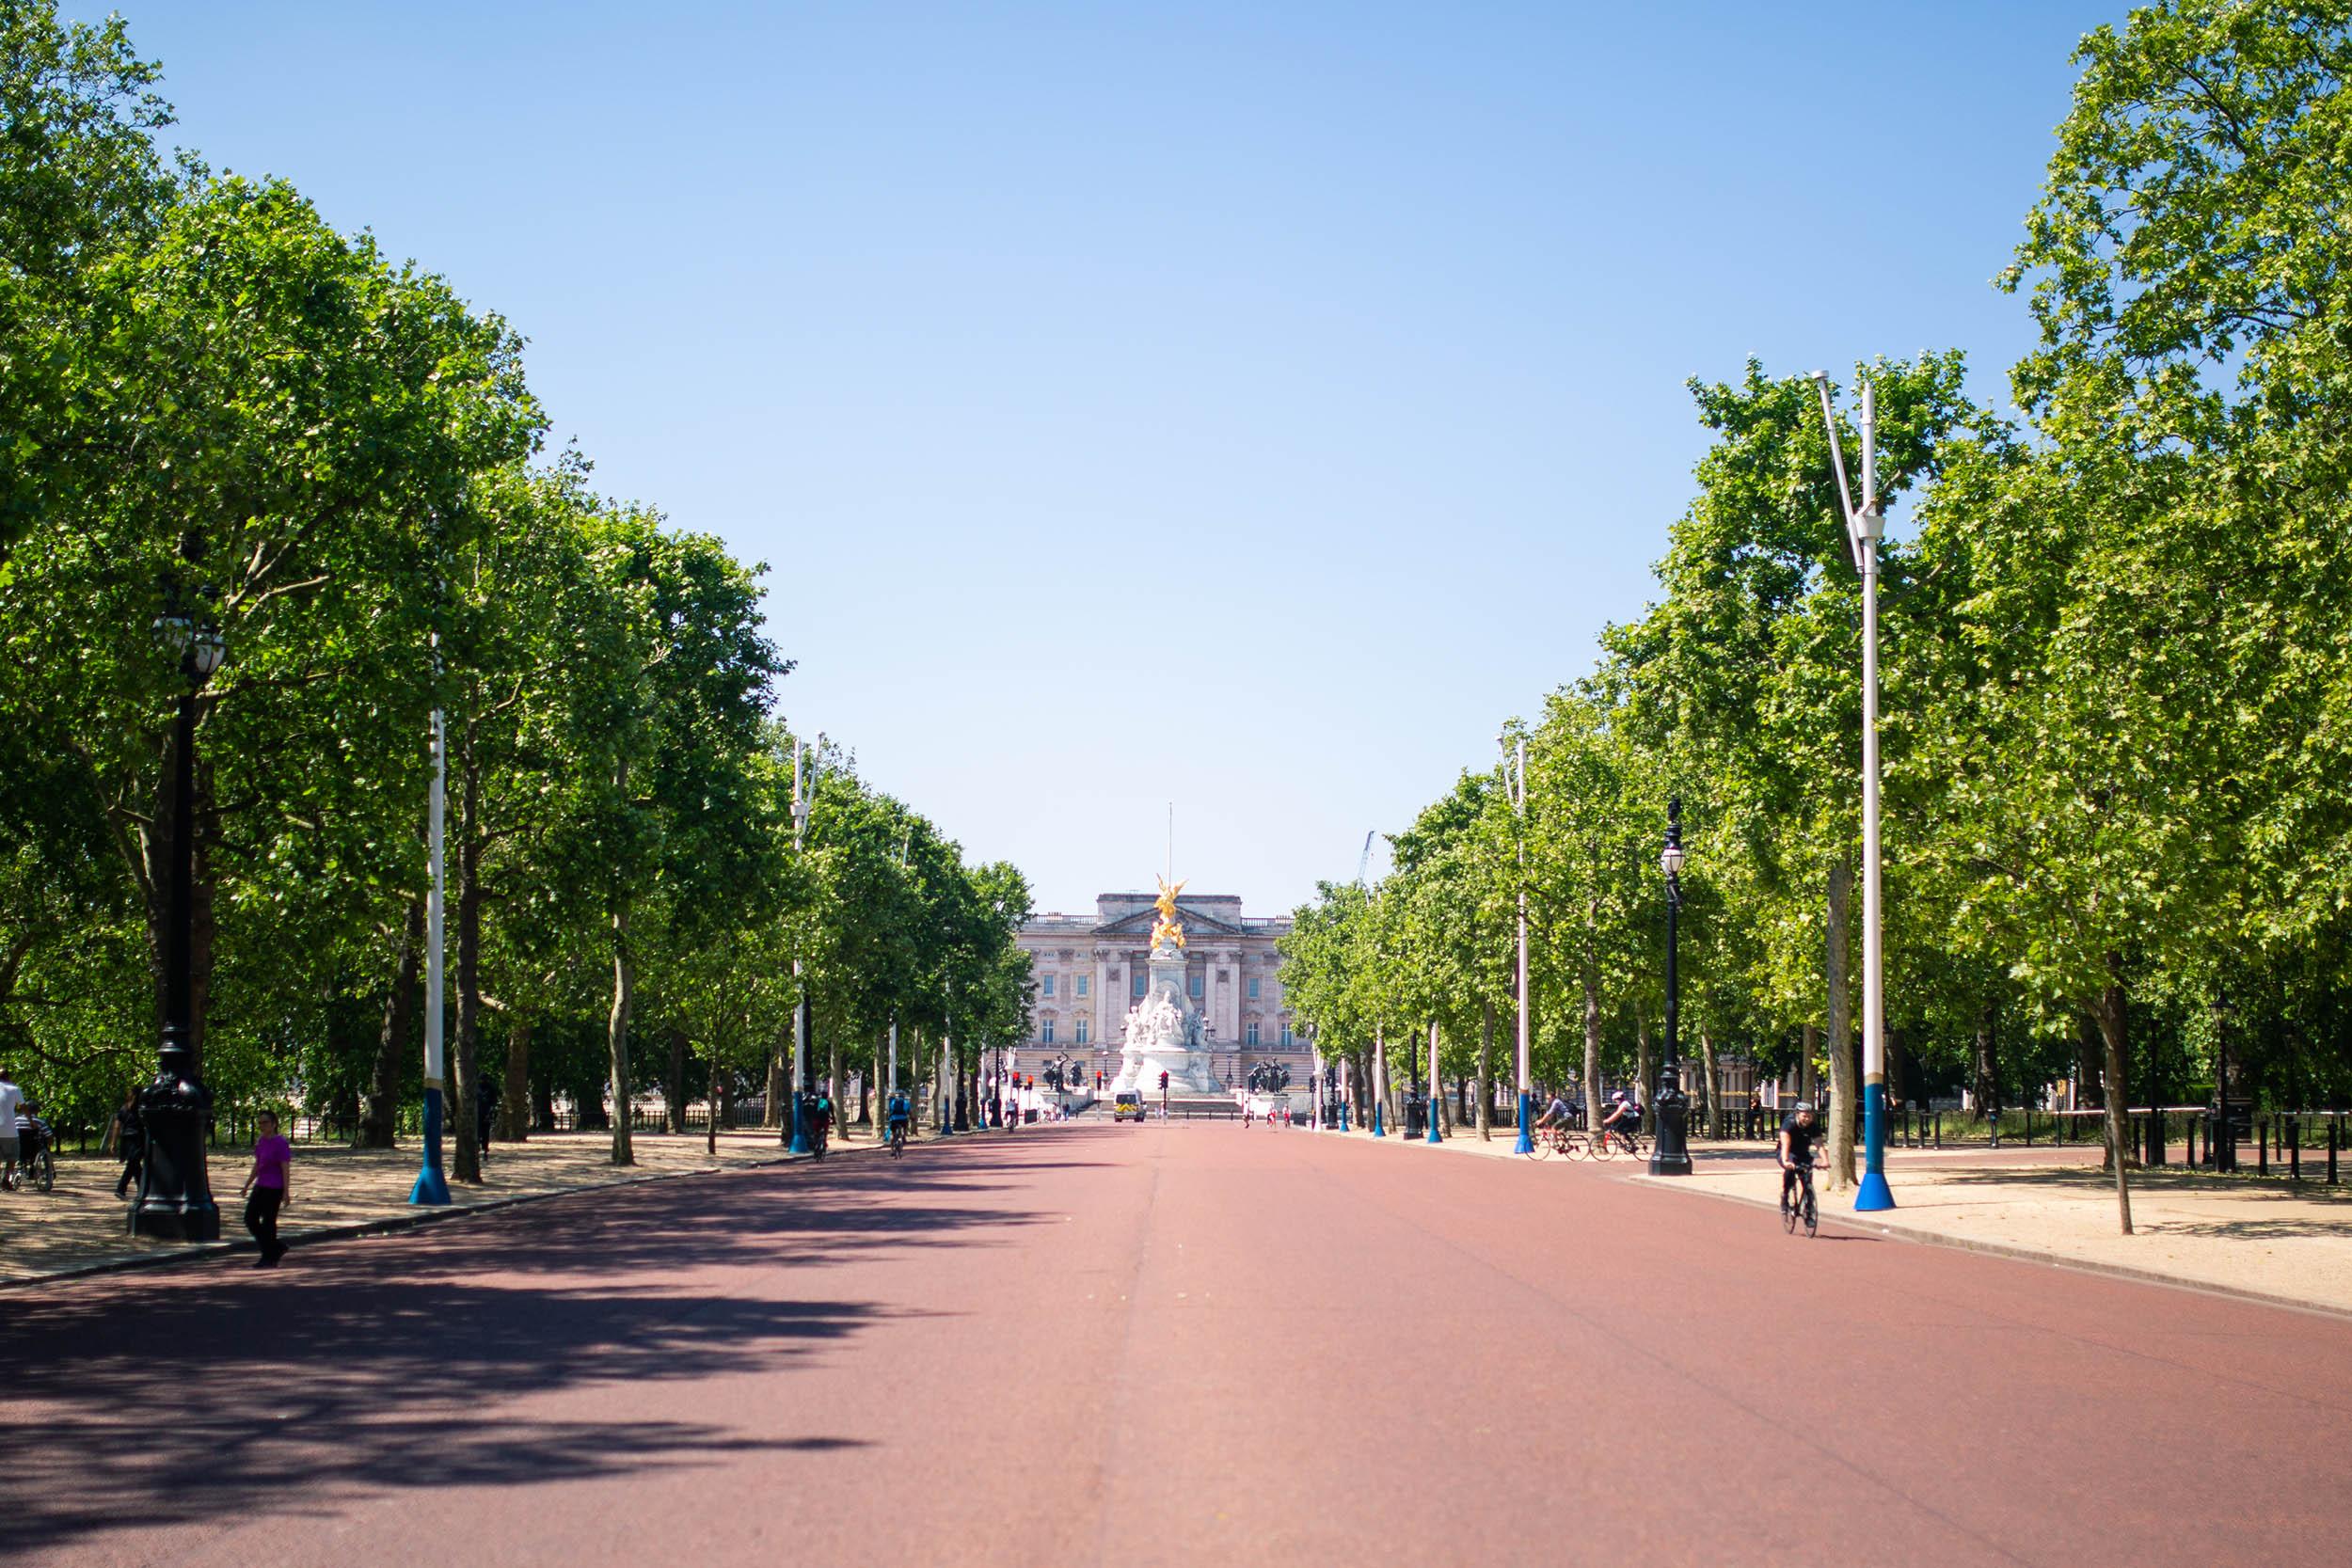 ENGLAND_LONDON_BUCKINGHAMPALACE_0015